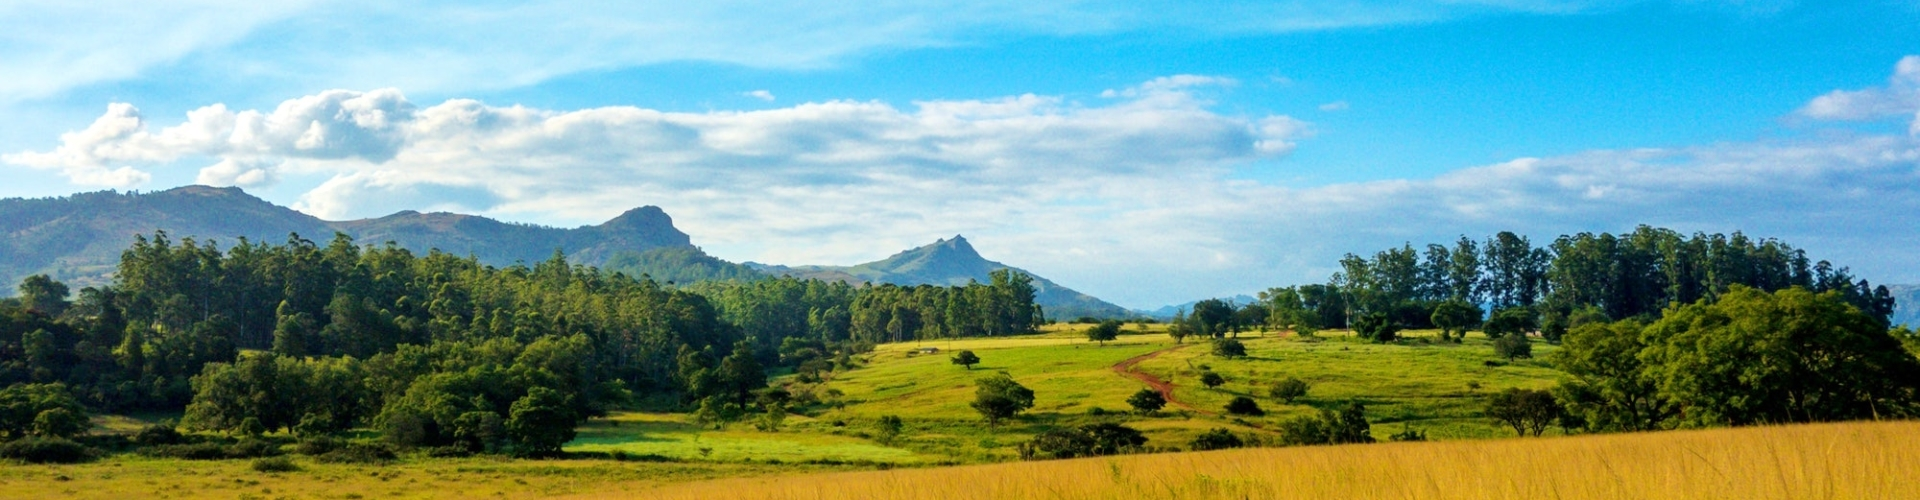 swaziland-eswatini-header